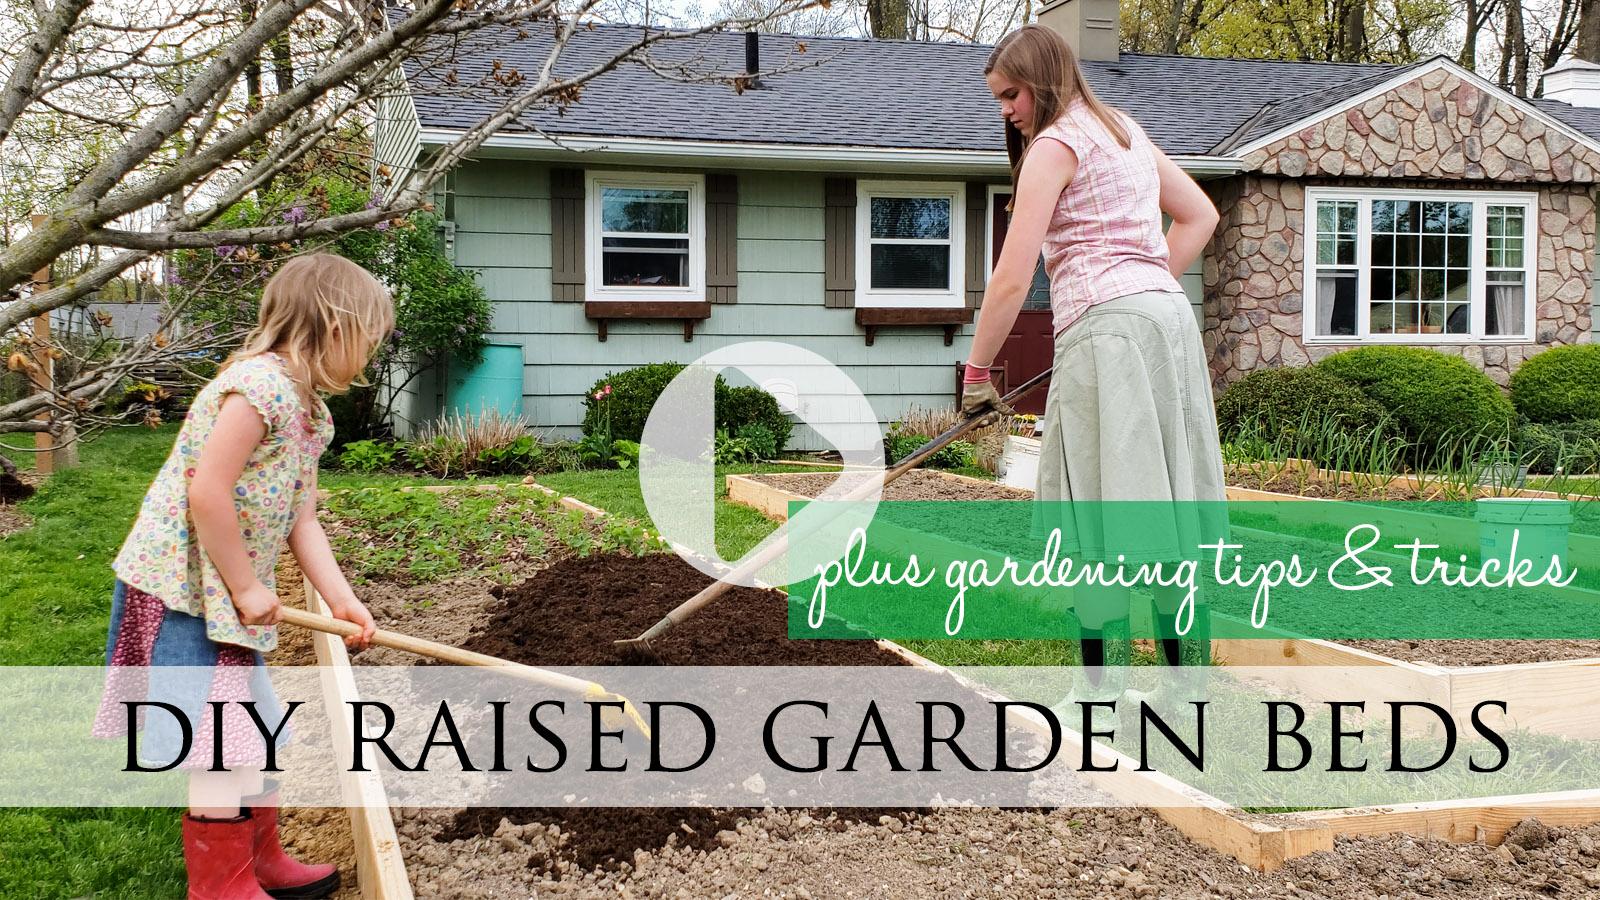 DIY Video Tutorial Raised Garden Beds by Prodigal Pieces | prodigalpieces.com